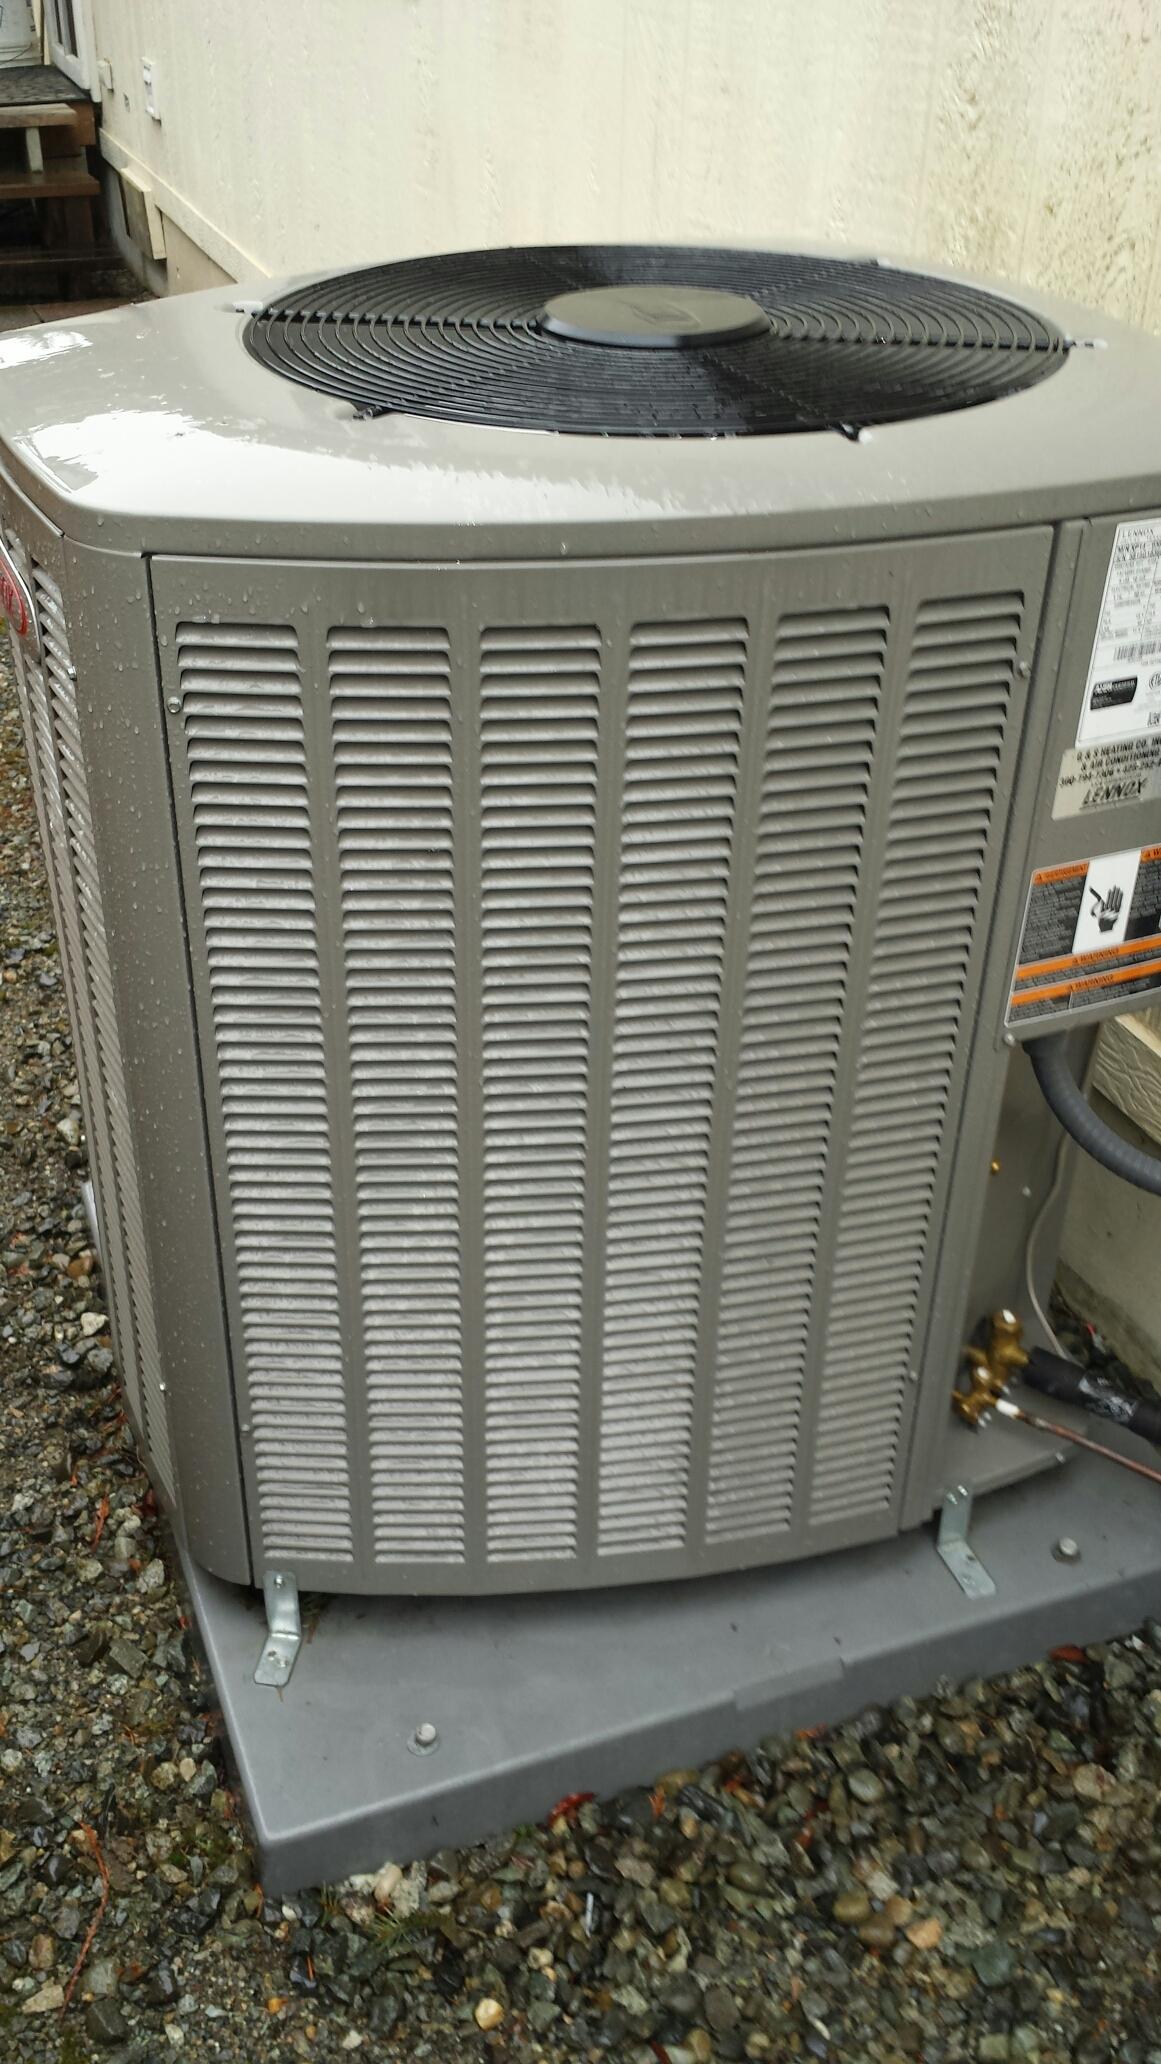 Everett, WA - Completed planned maintenence on Lennox heat pump in everett.